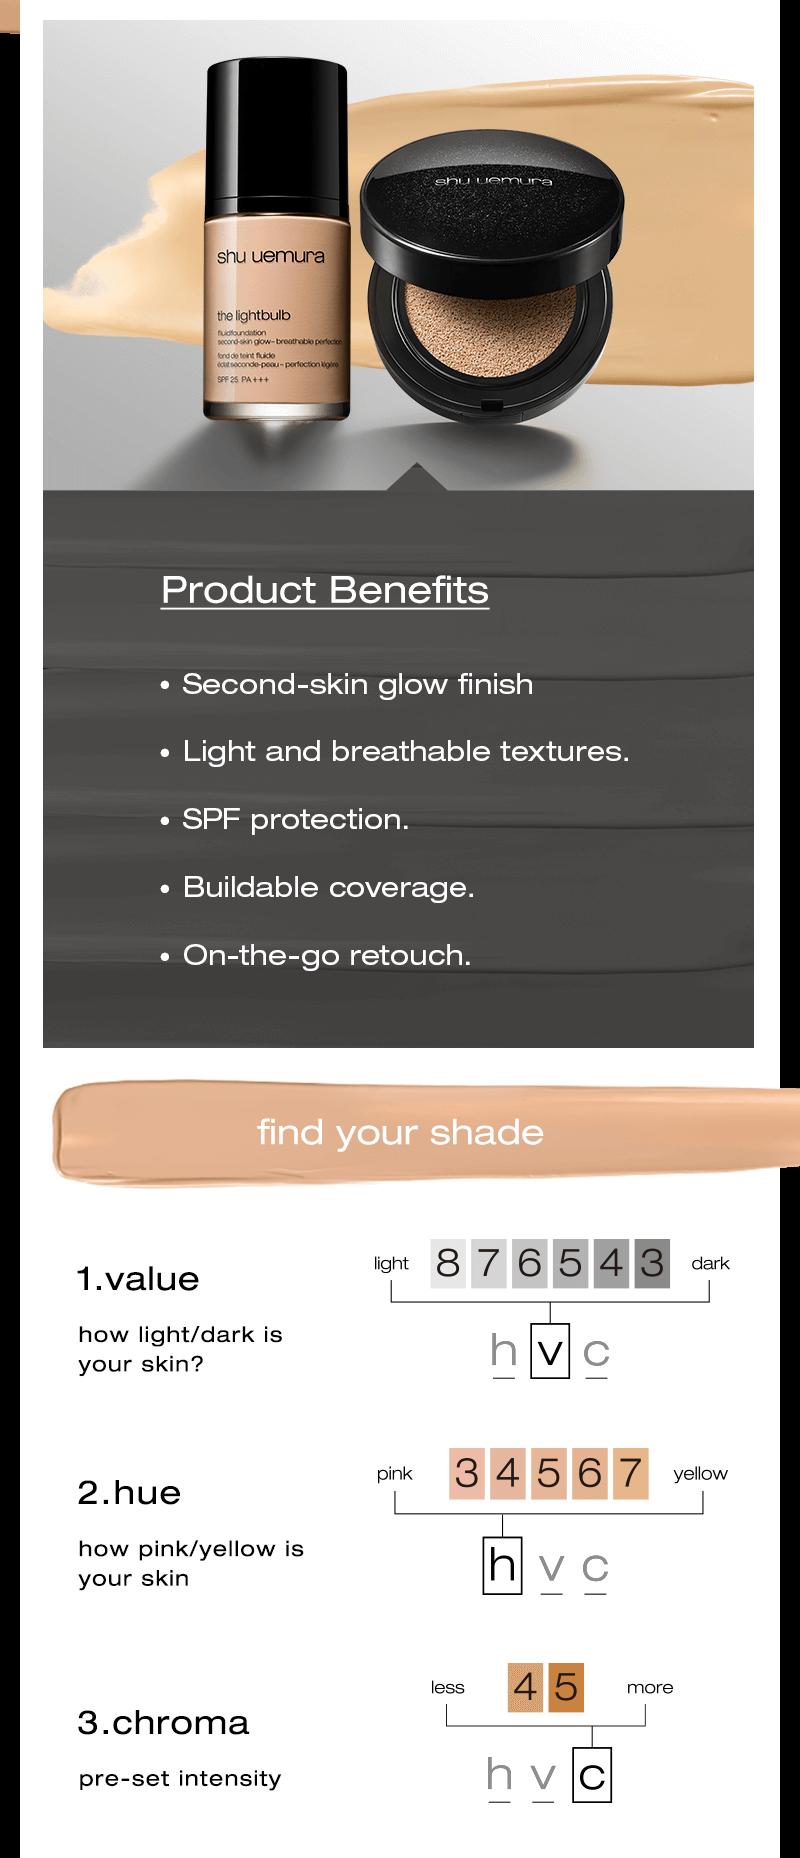 shu uemura lightbulb foundation product speciality